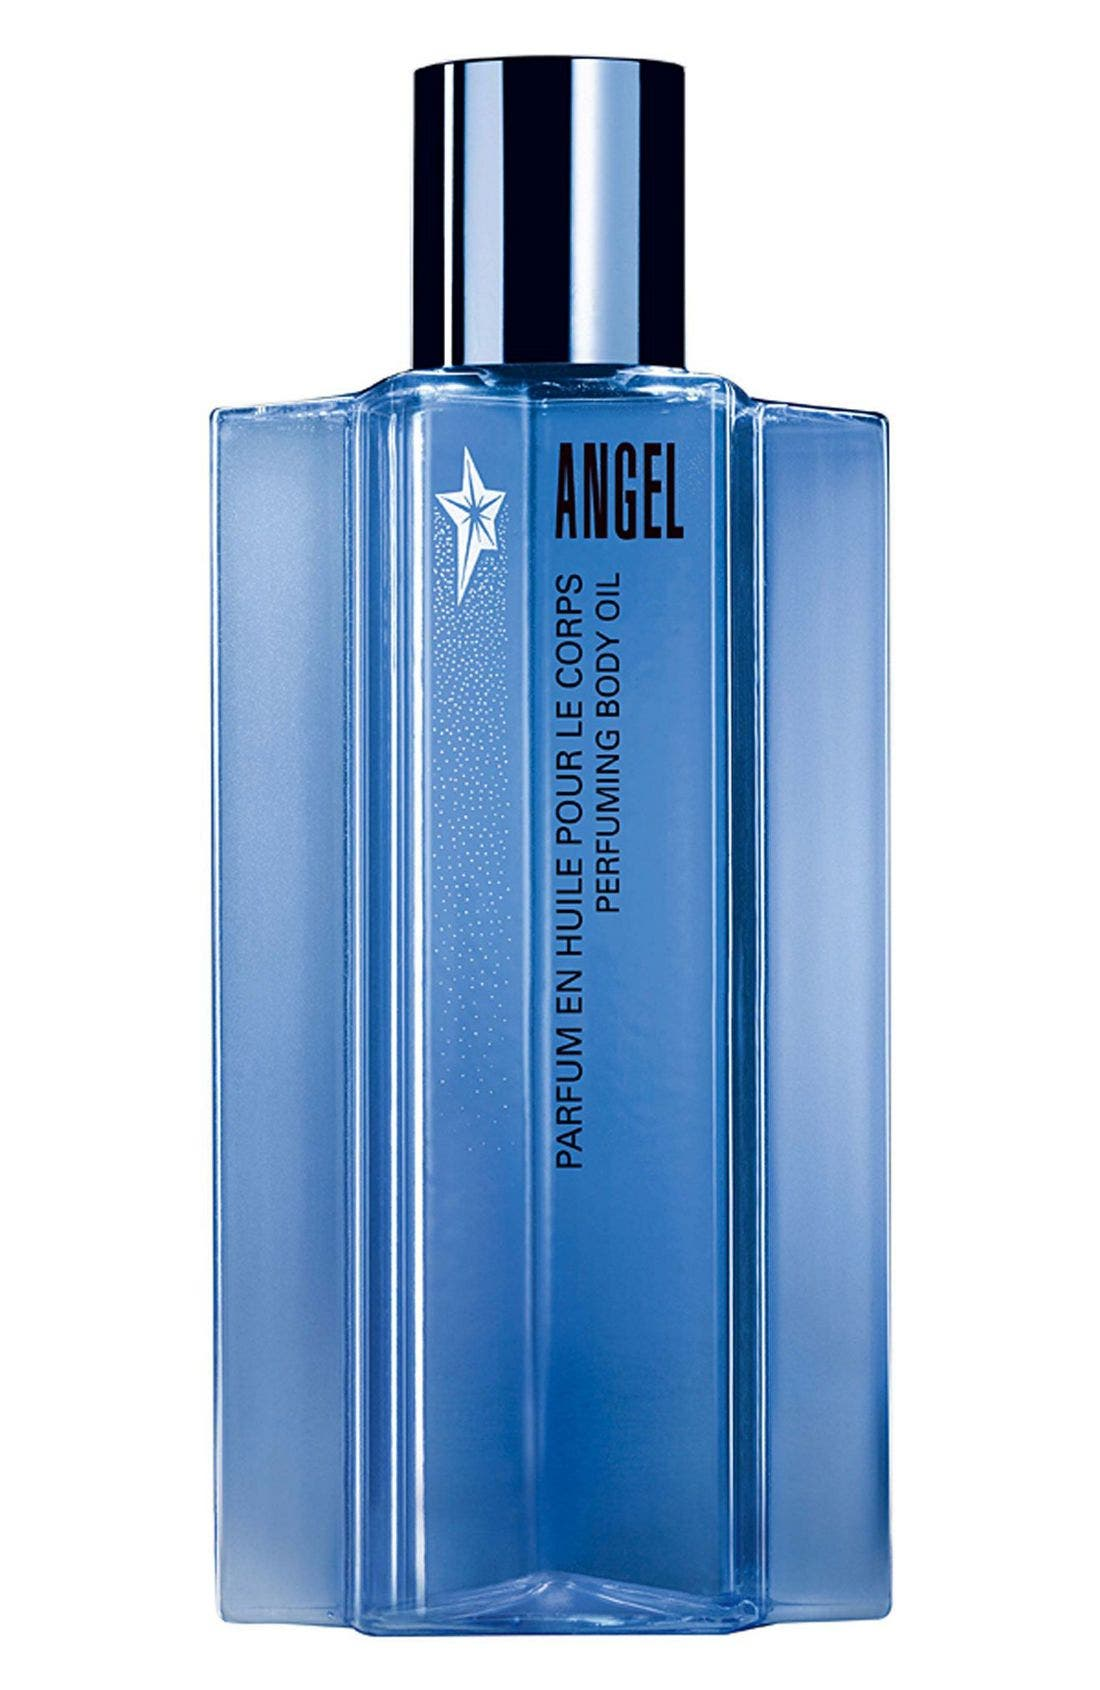 Perfume Angel Perfume By Thierry Mugler Nordstrom